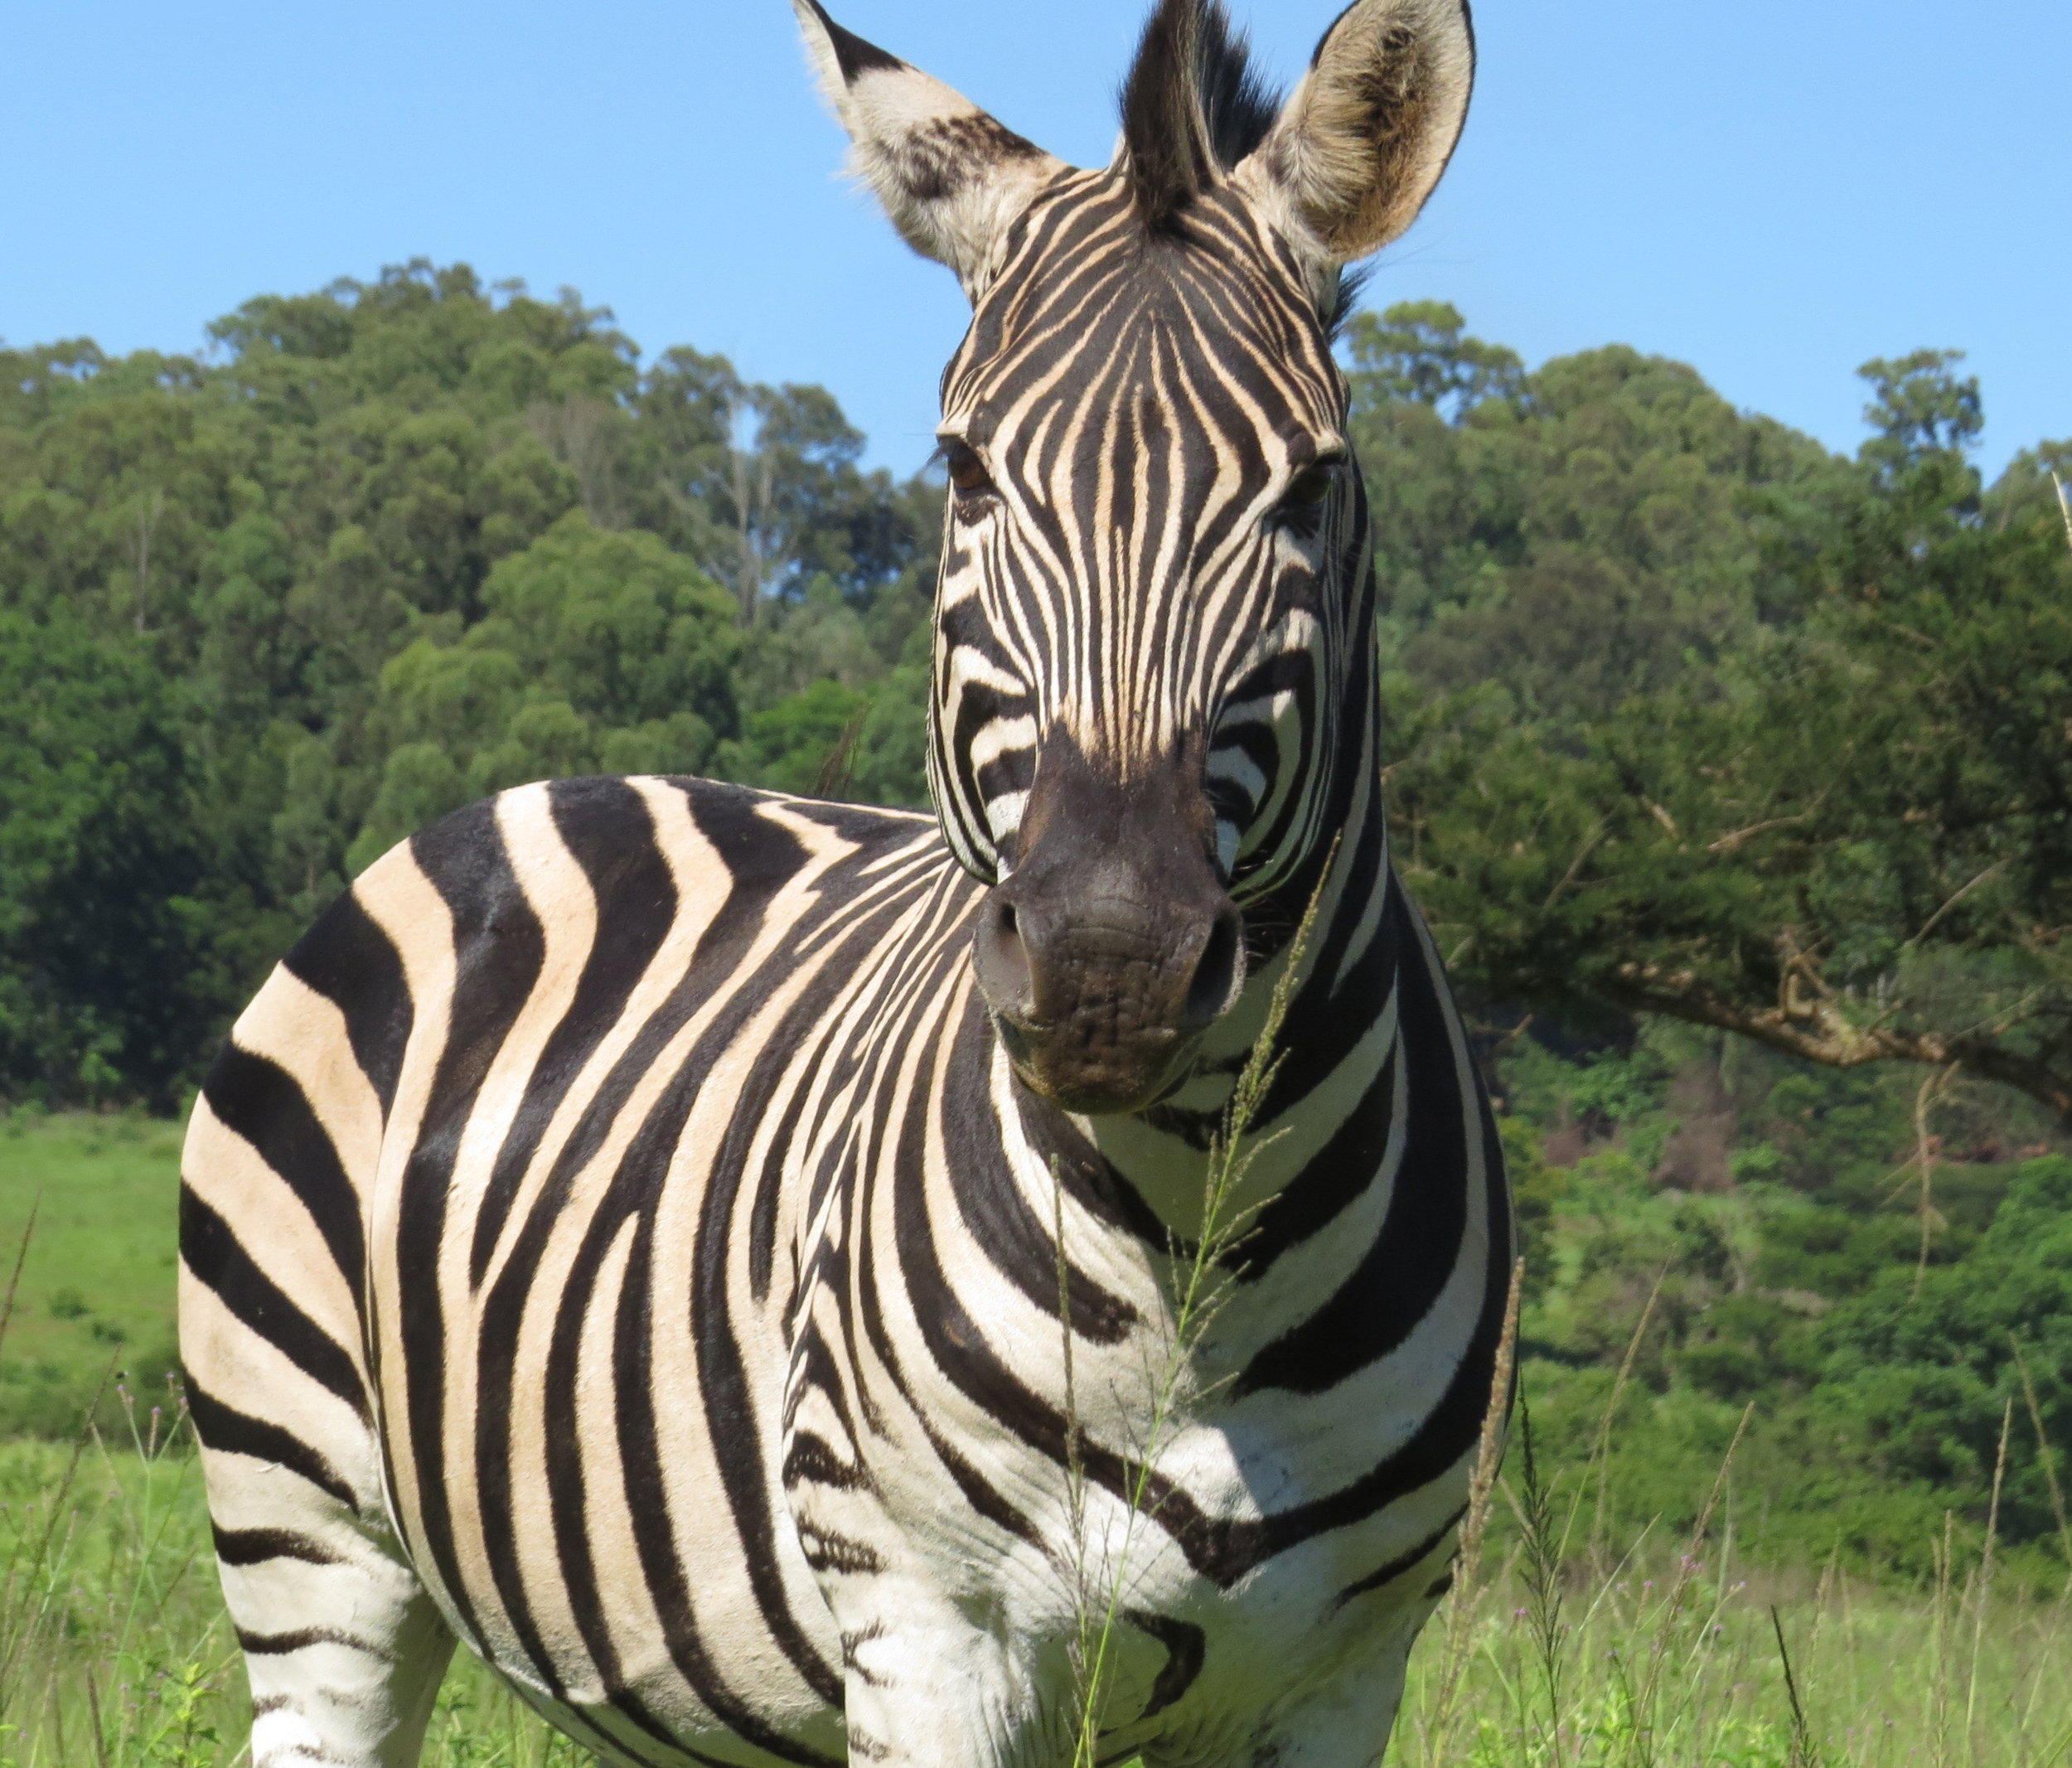 Zebras showed no fear